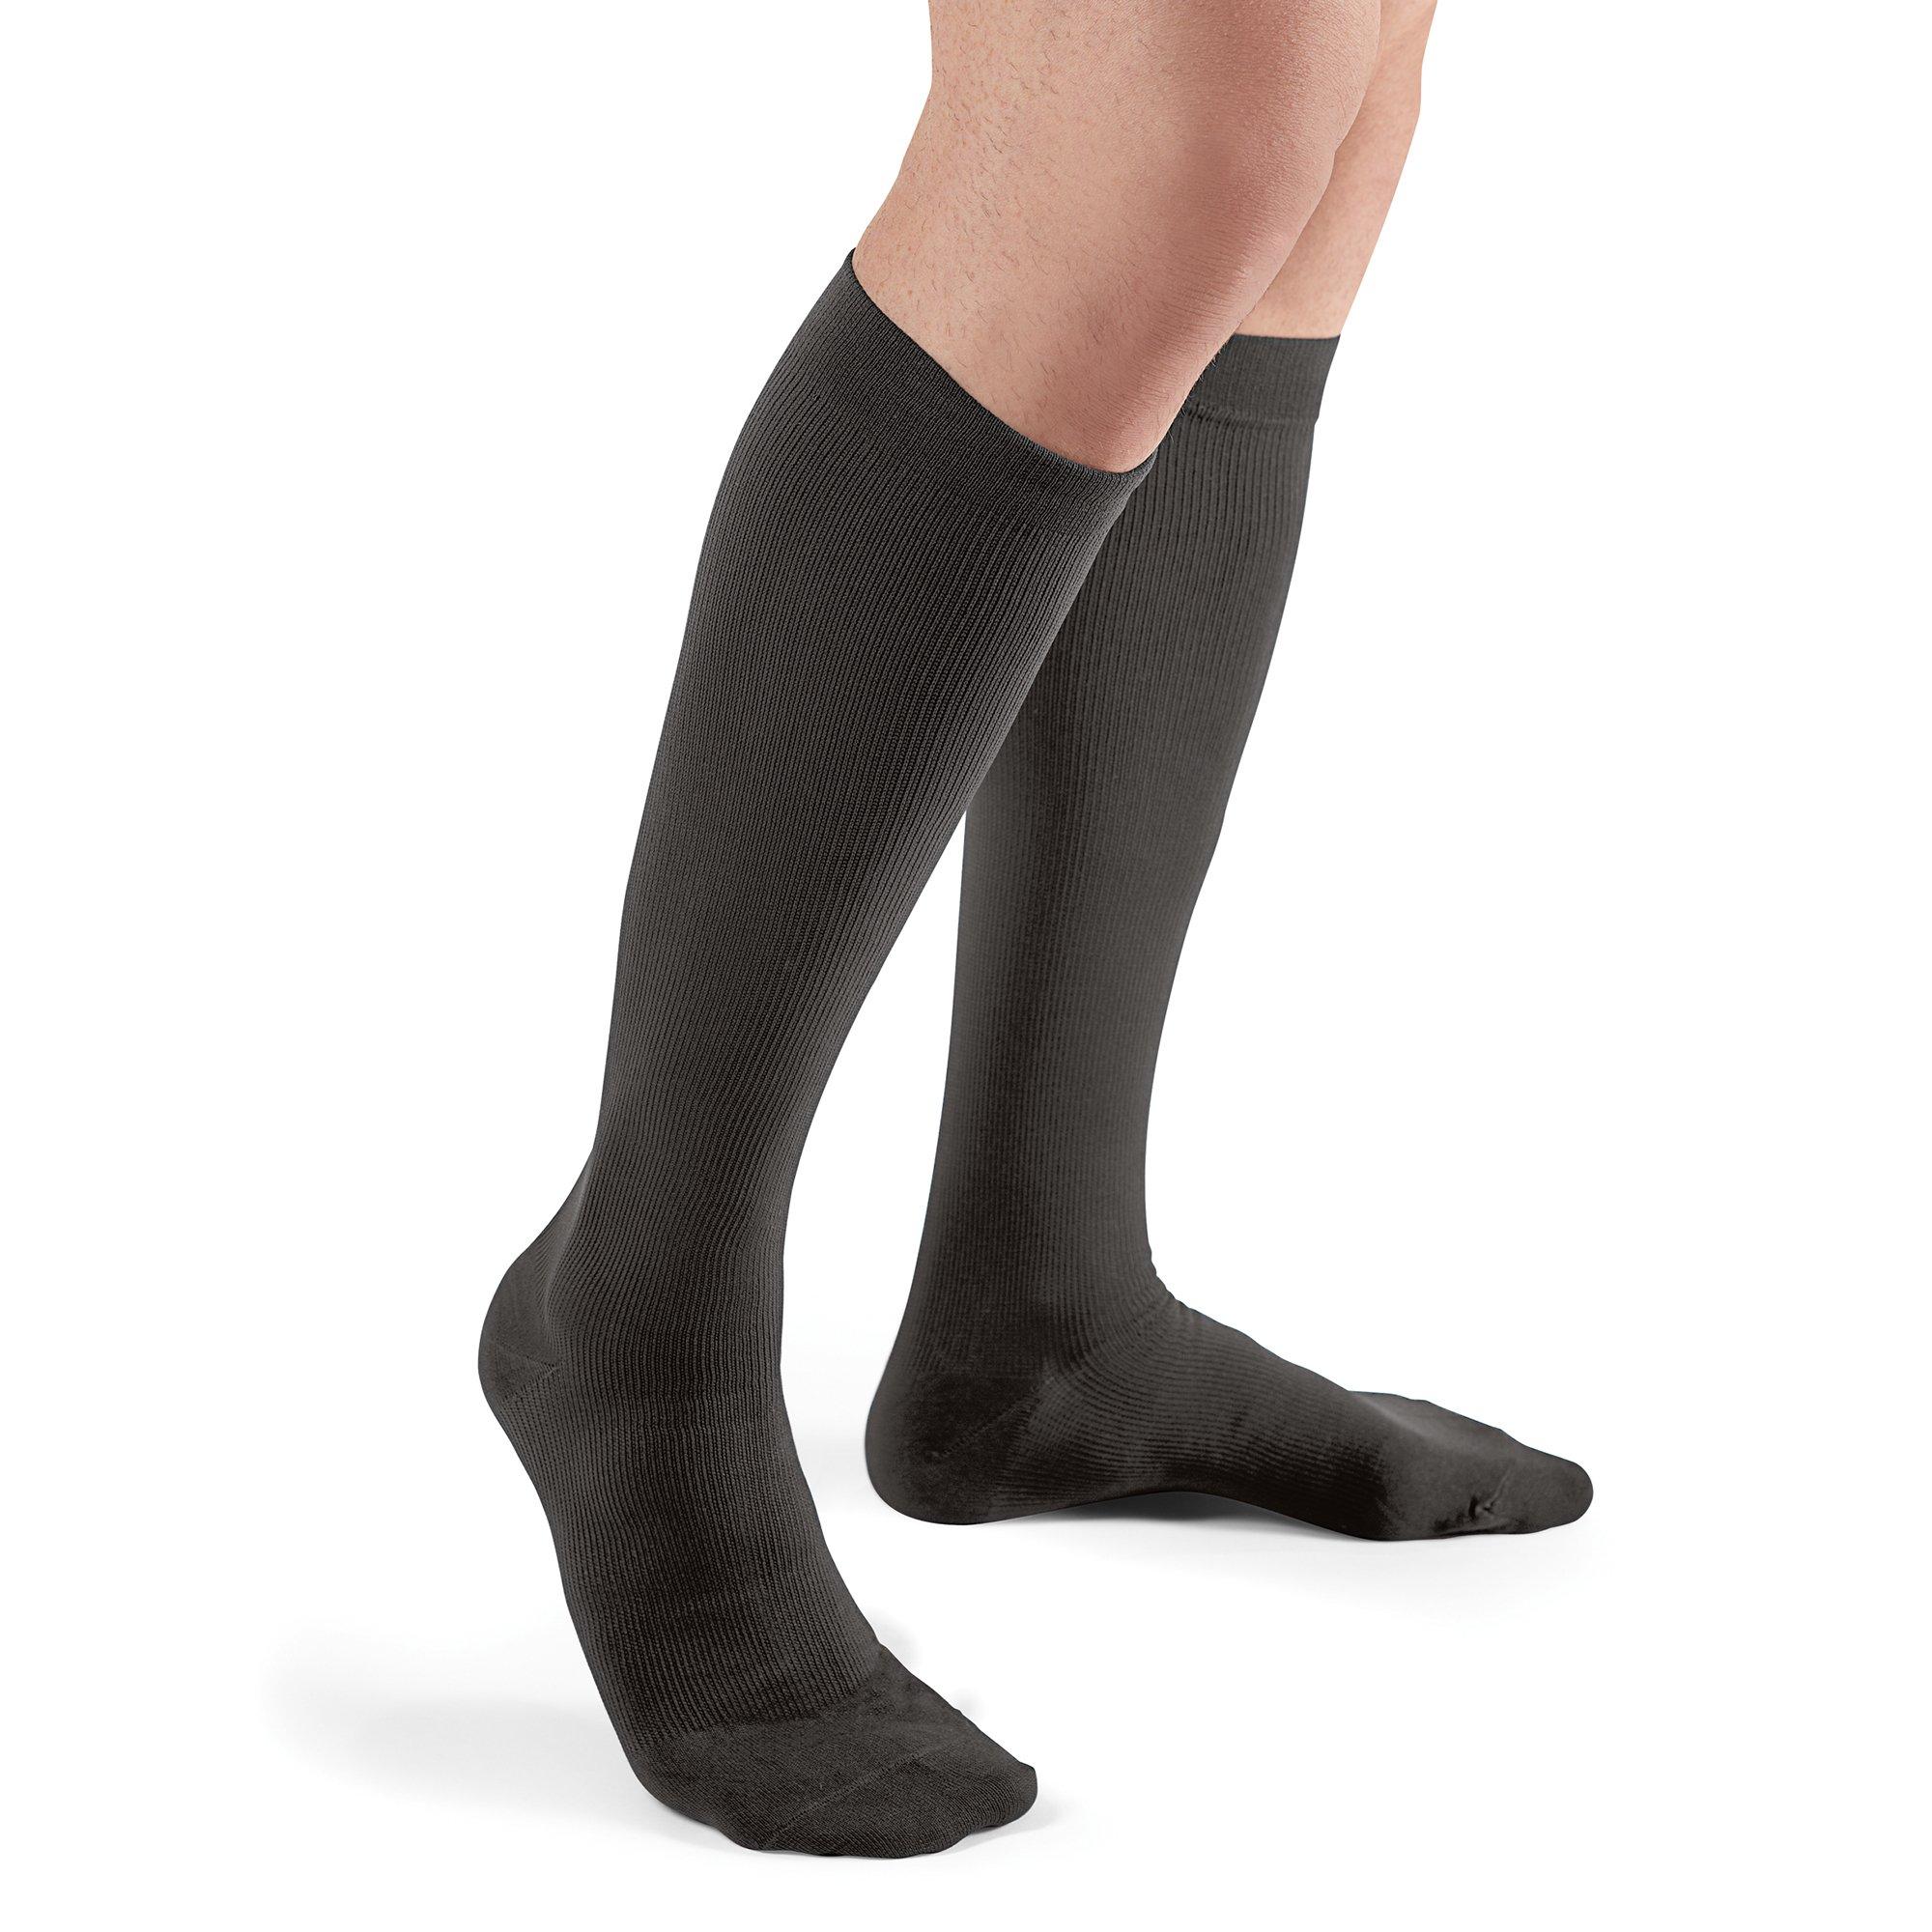 Futuro Restoring Dress Socks for Men, Helps Improve Circulation, Eases Symptoms of Mild Spider Veins, Over the Calf, X-Large, Black, Firm Compression